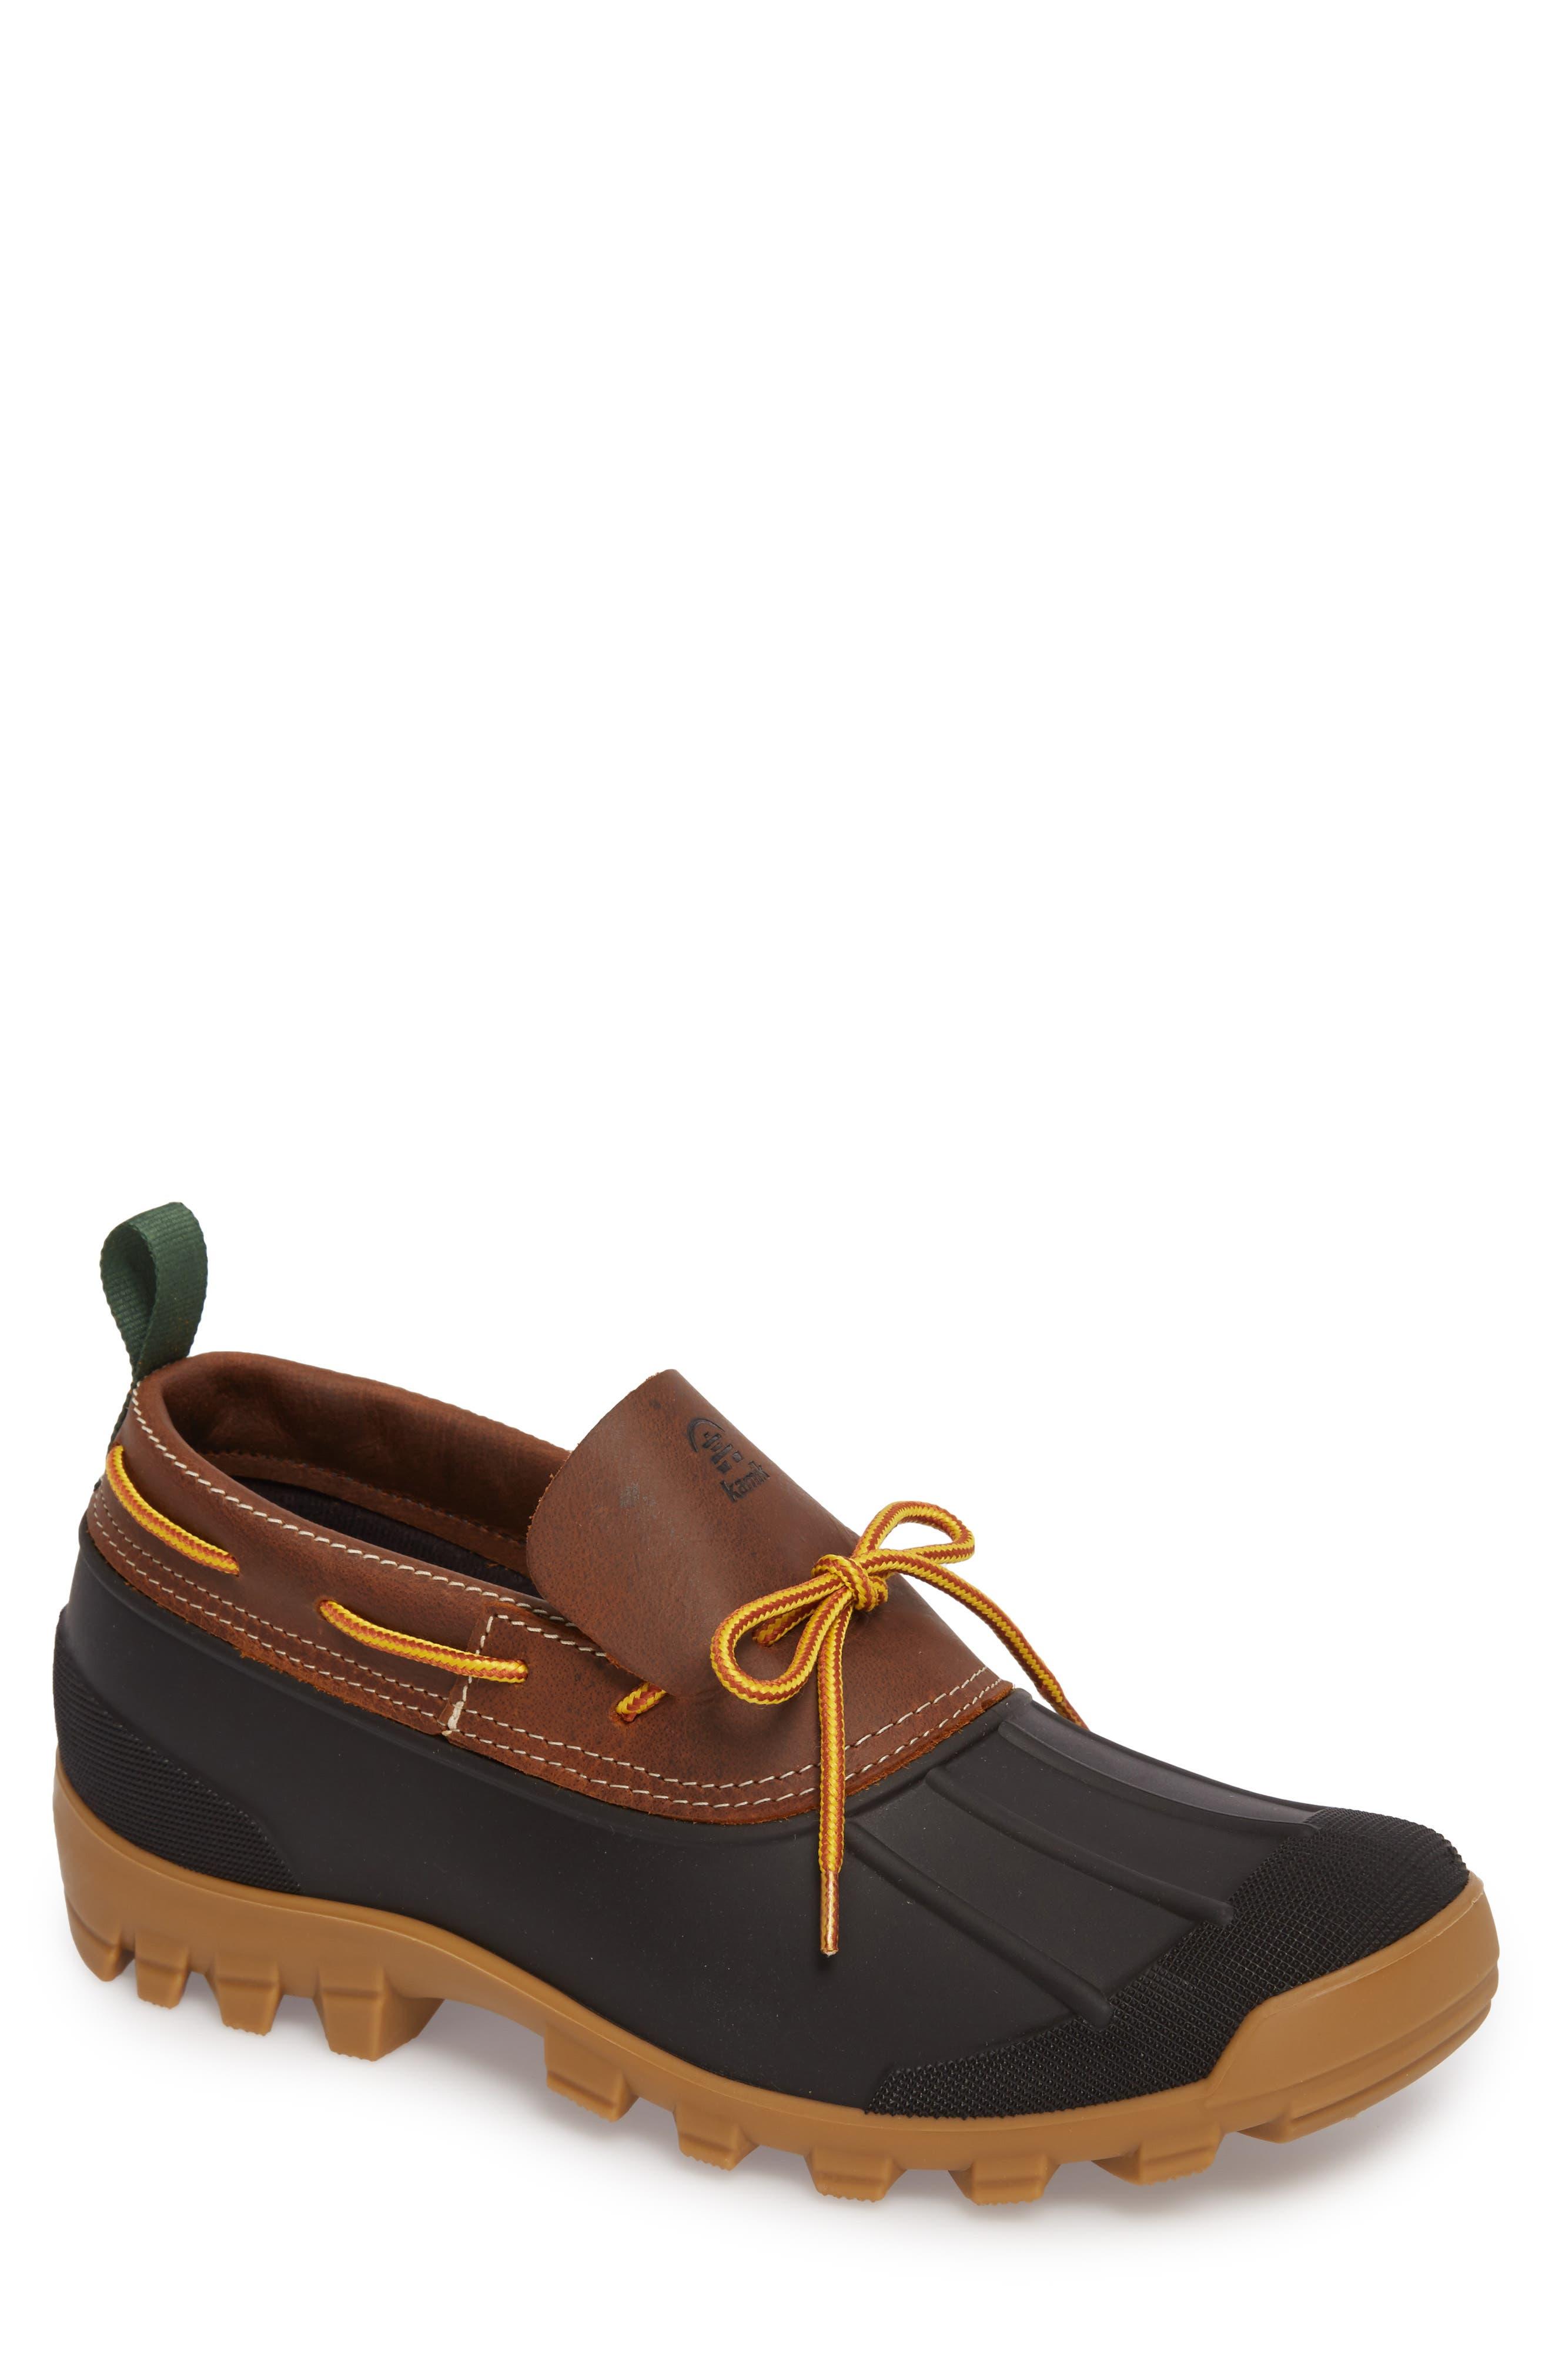 Yukon Short Boot,                             Main thumbnail 1, color,                             Dark Brown Leather